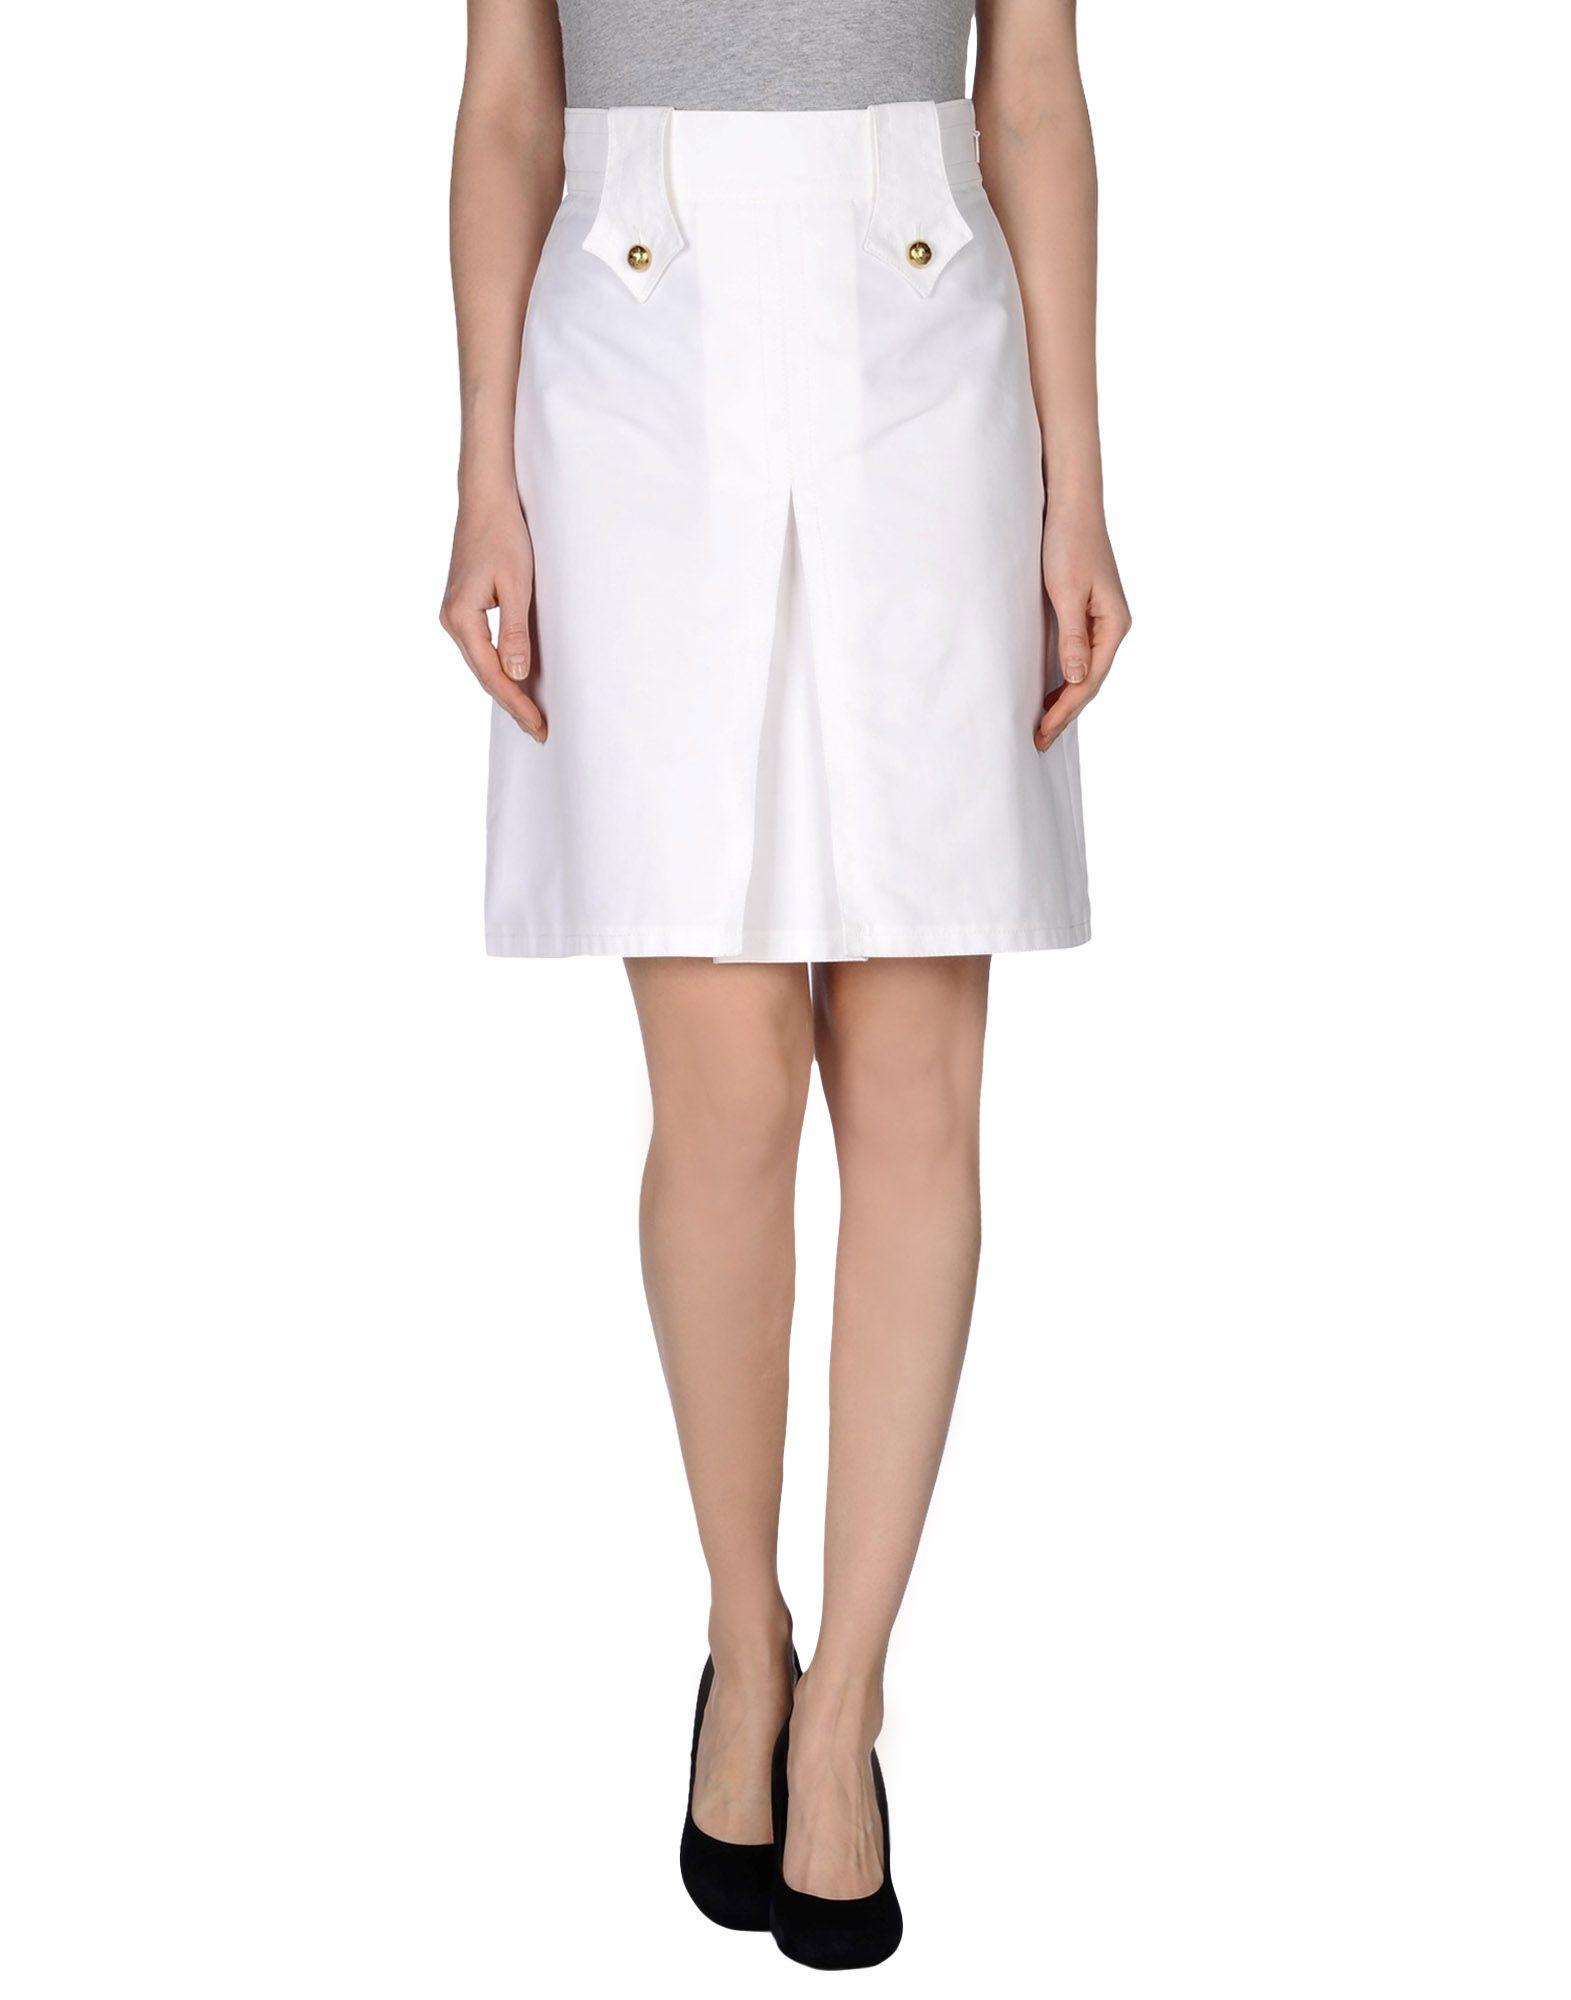 gucci knee length skirt in white lyst